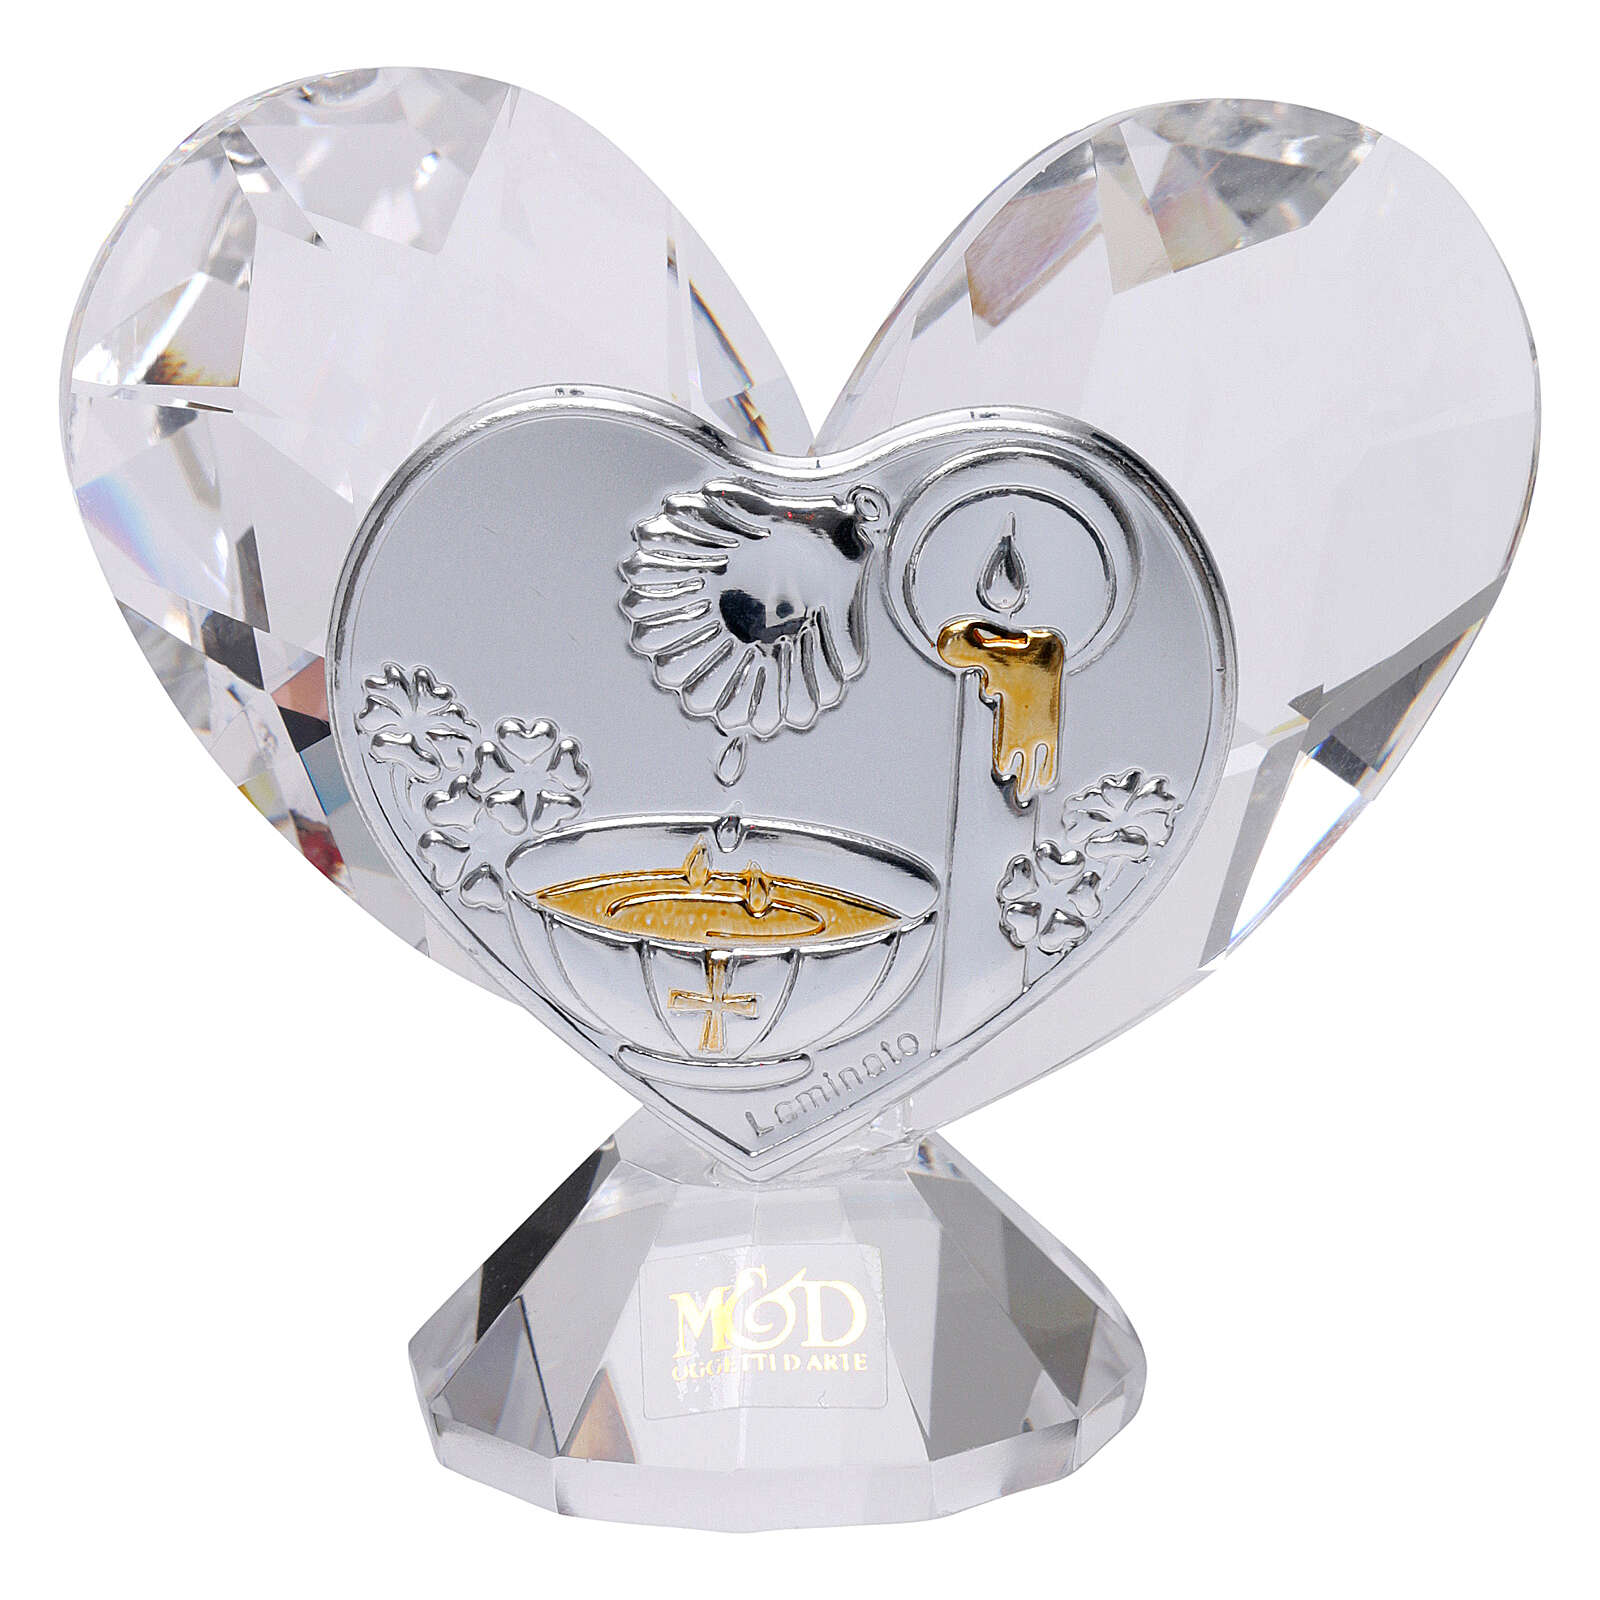 Heart shaped ornament Baptism souvenir 2x2 in 3